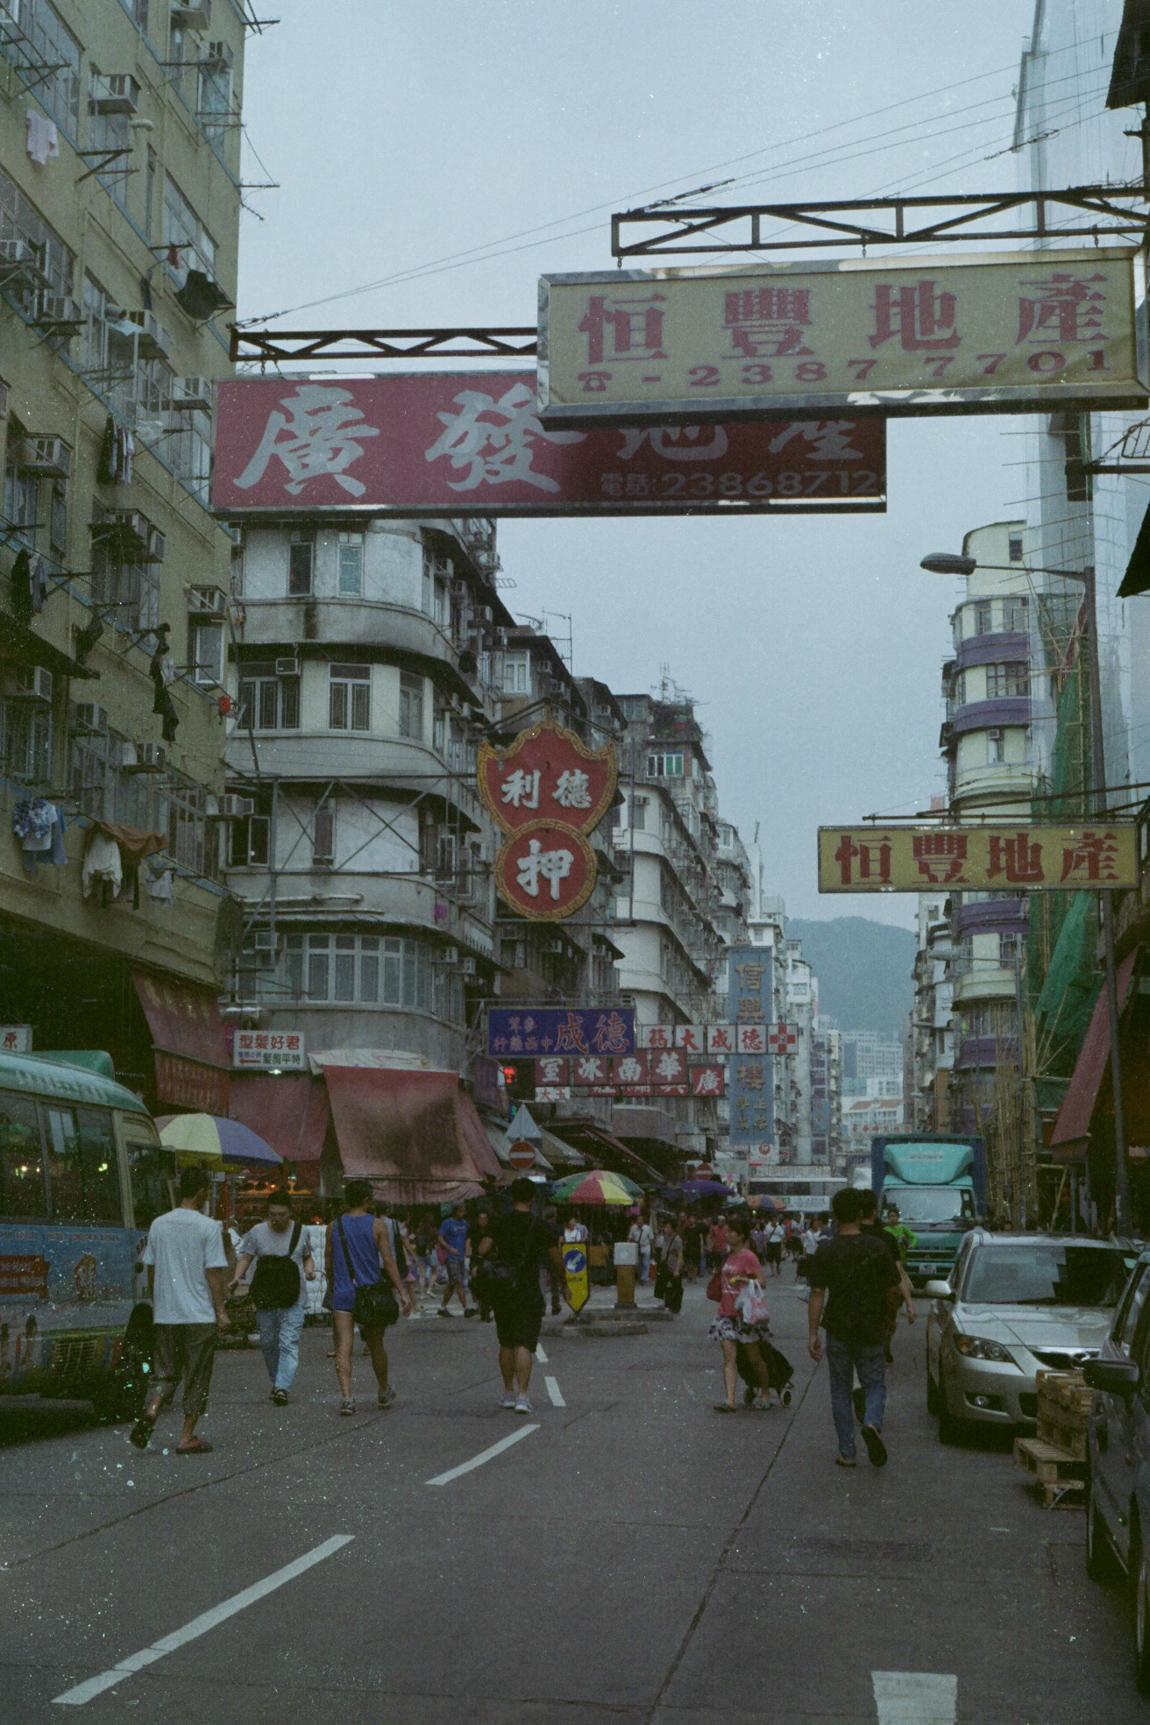 Hong Kong 香港 on Film